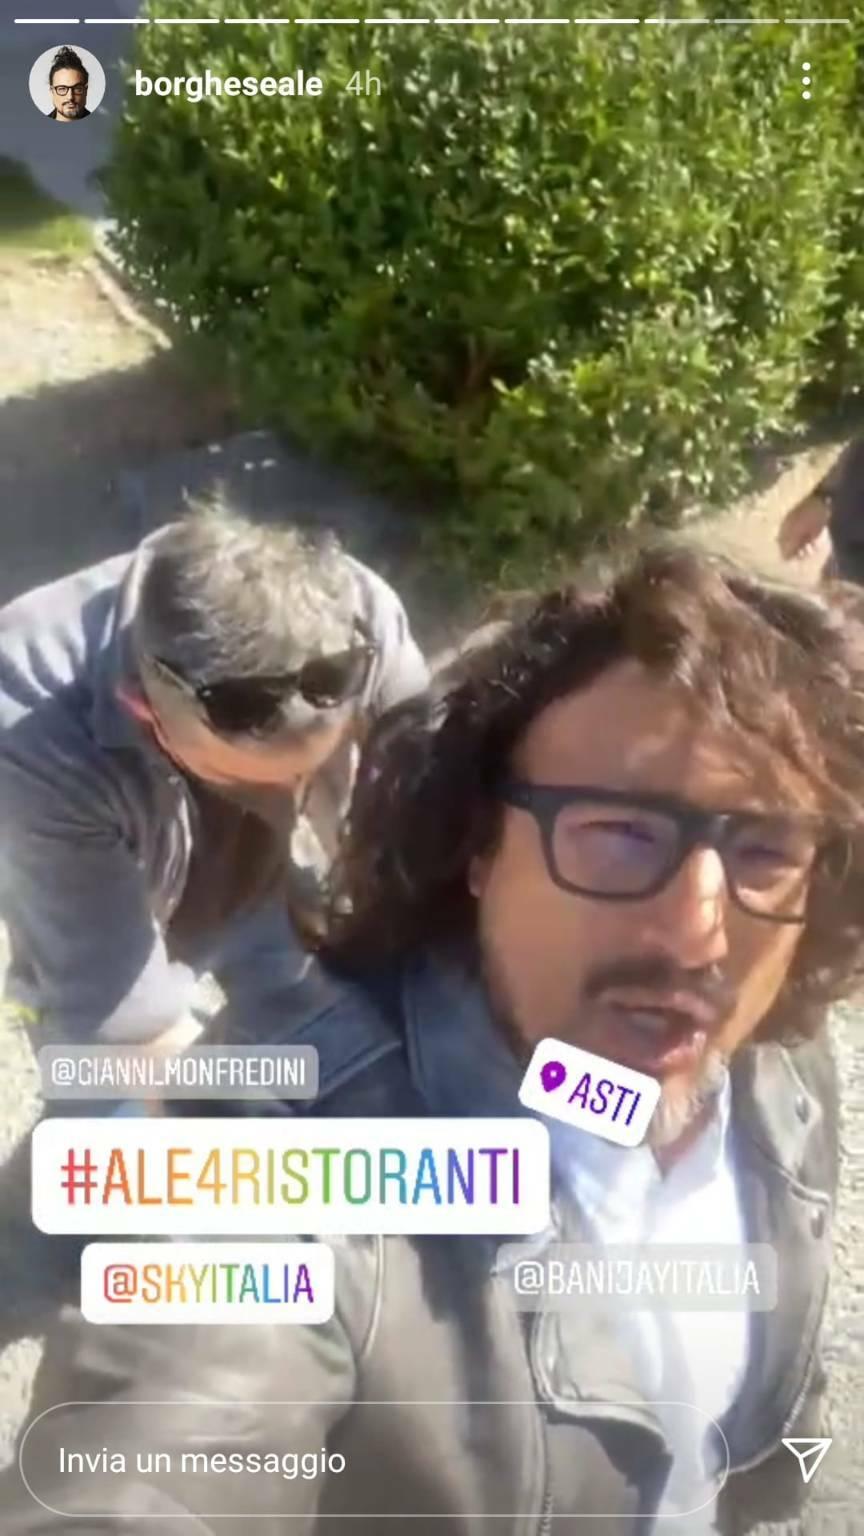 borghese instagram astigiano